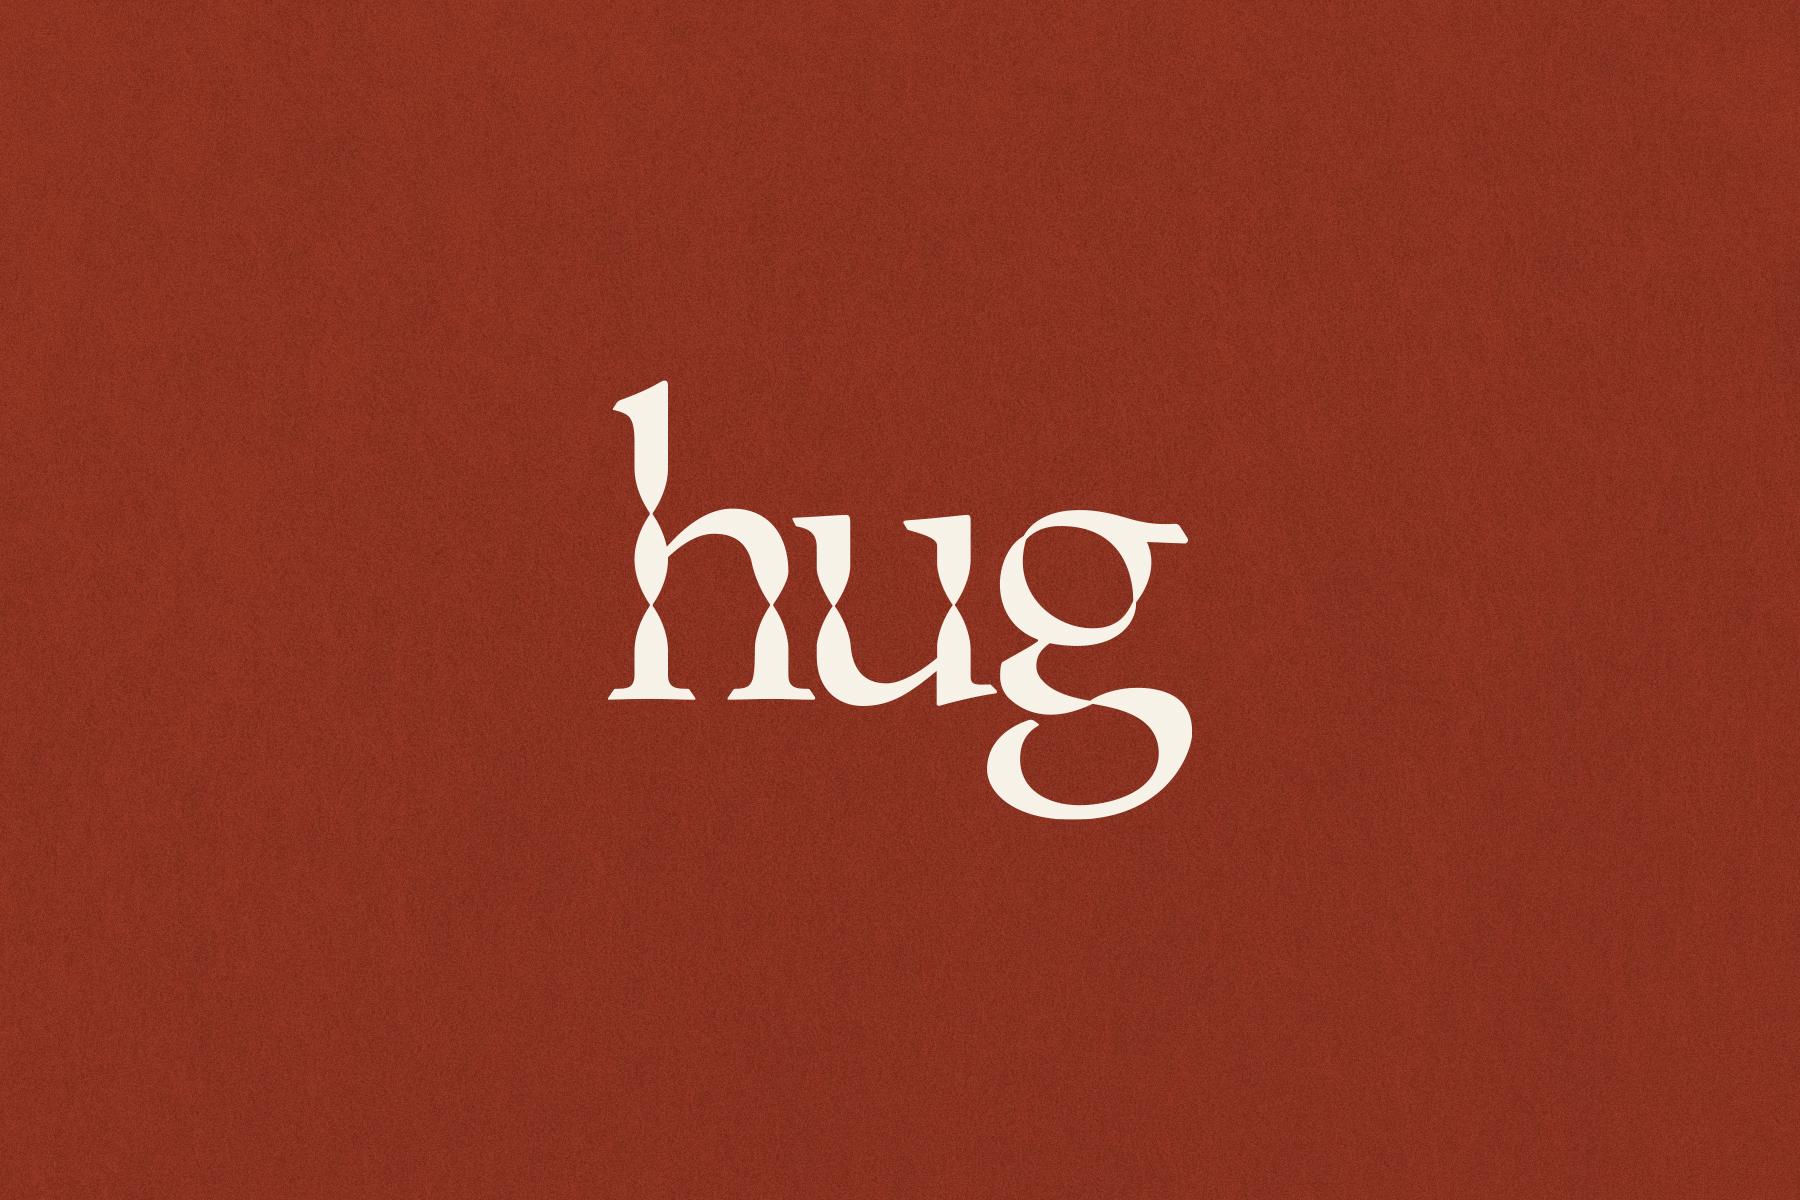 hug_logo_01_v1.jpg